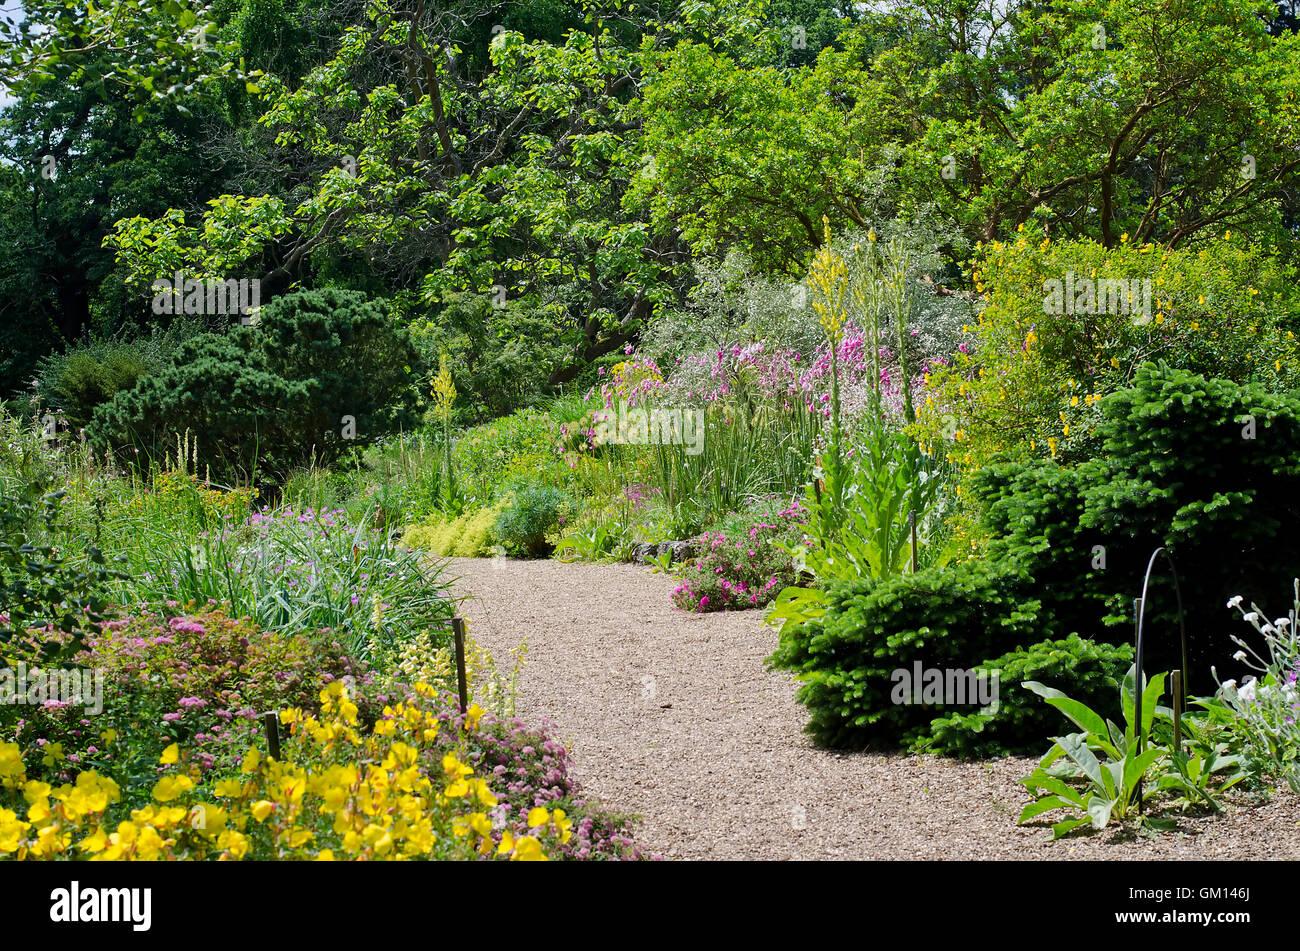 English gardens, UK - Stock Image